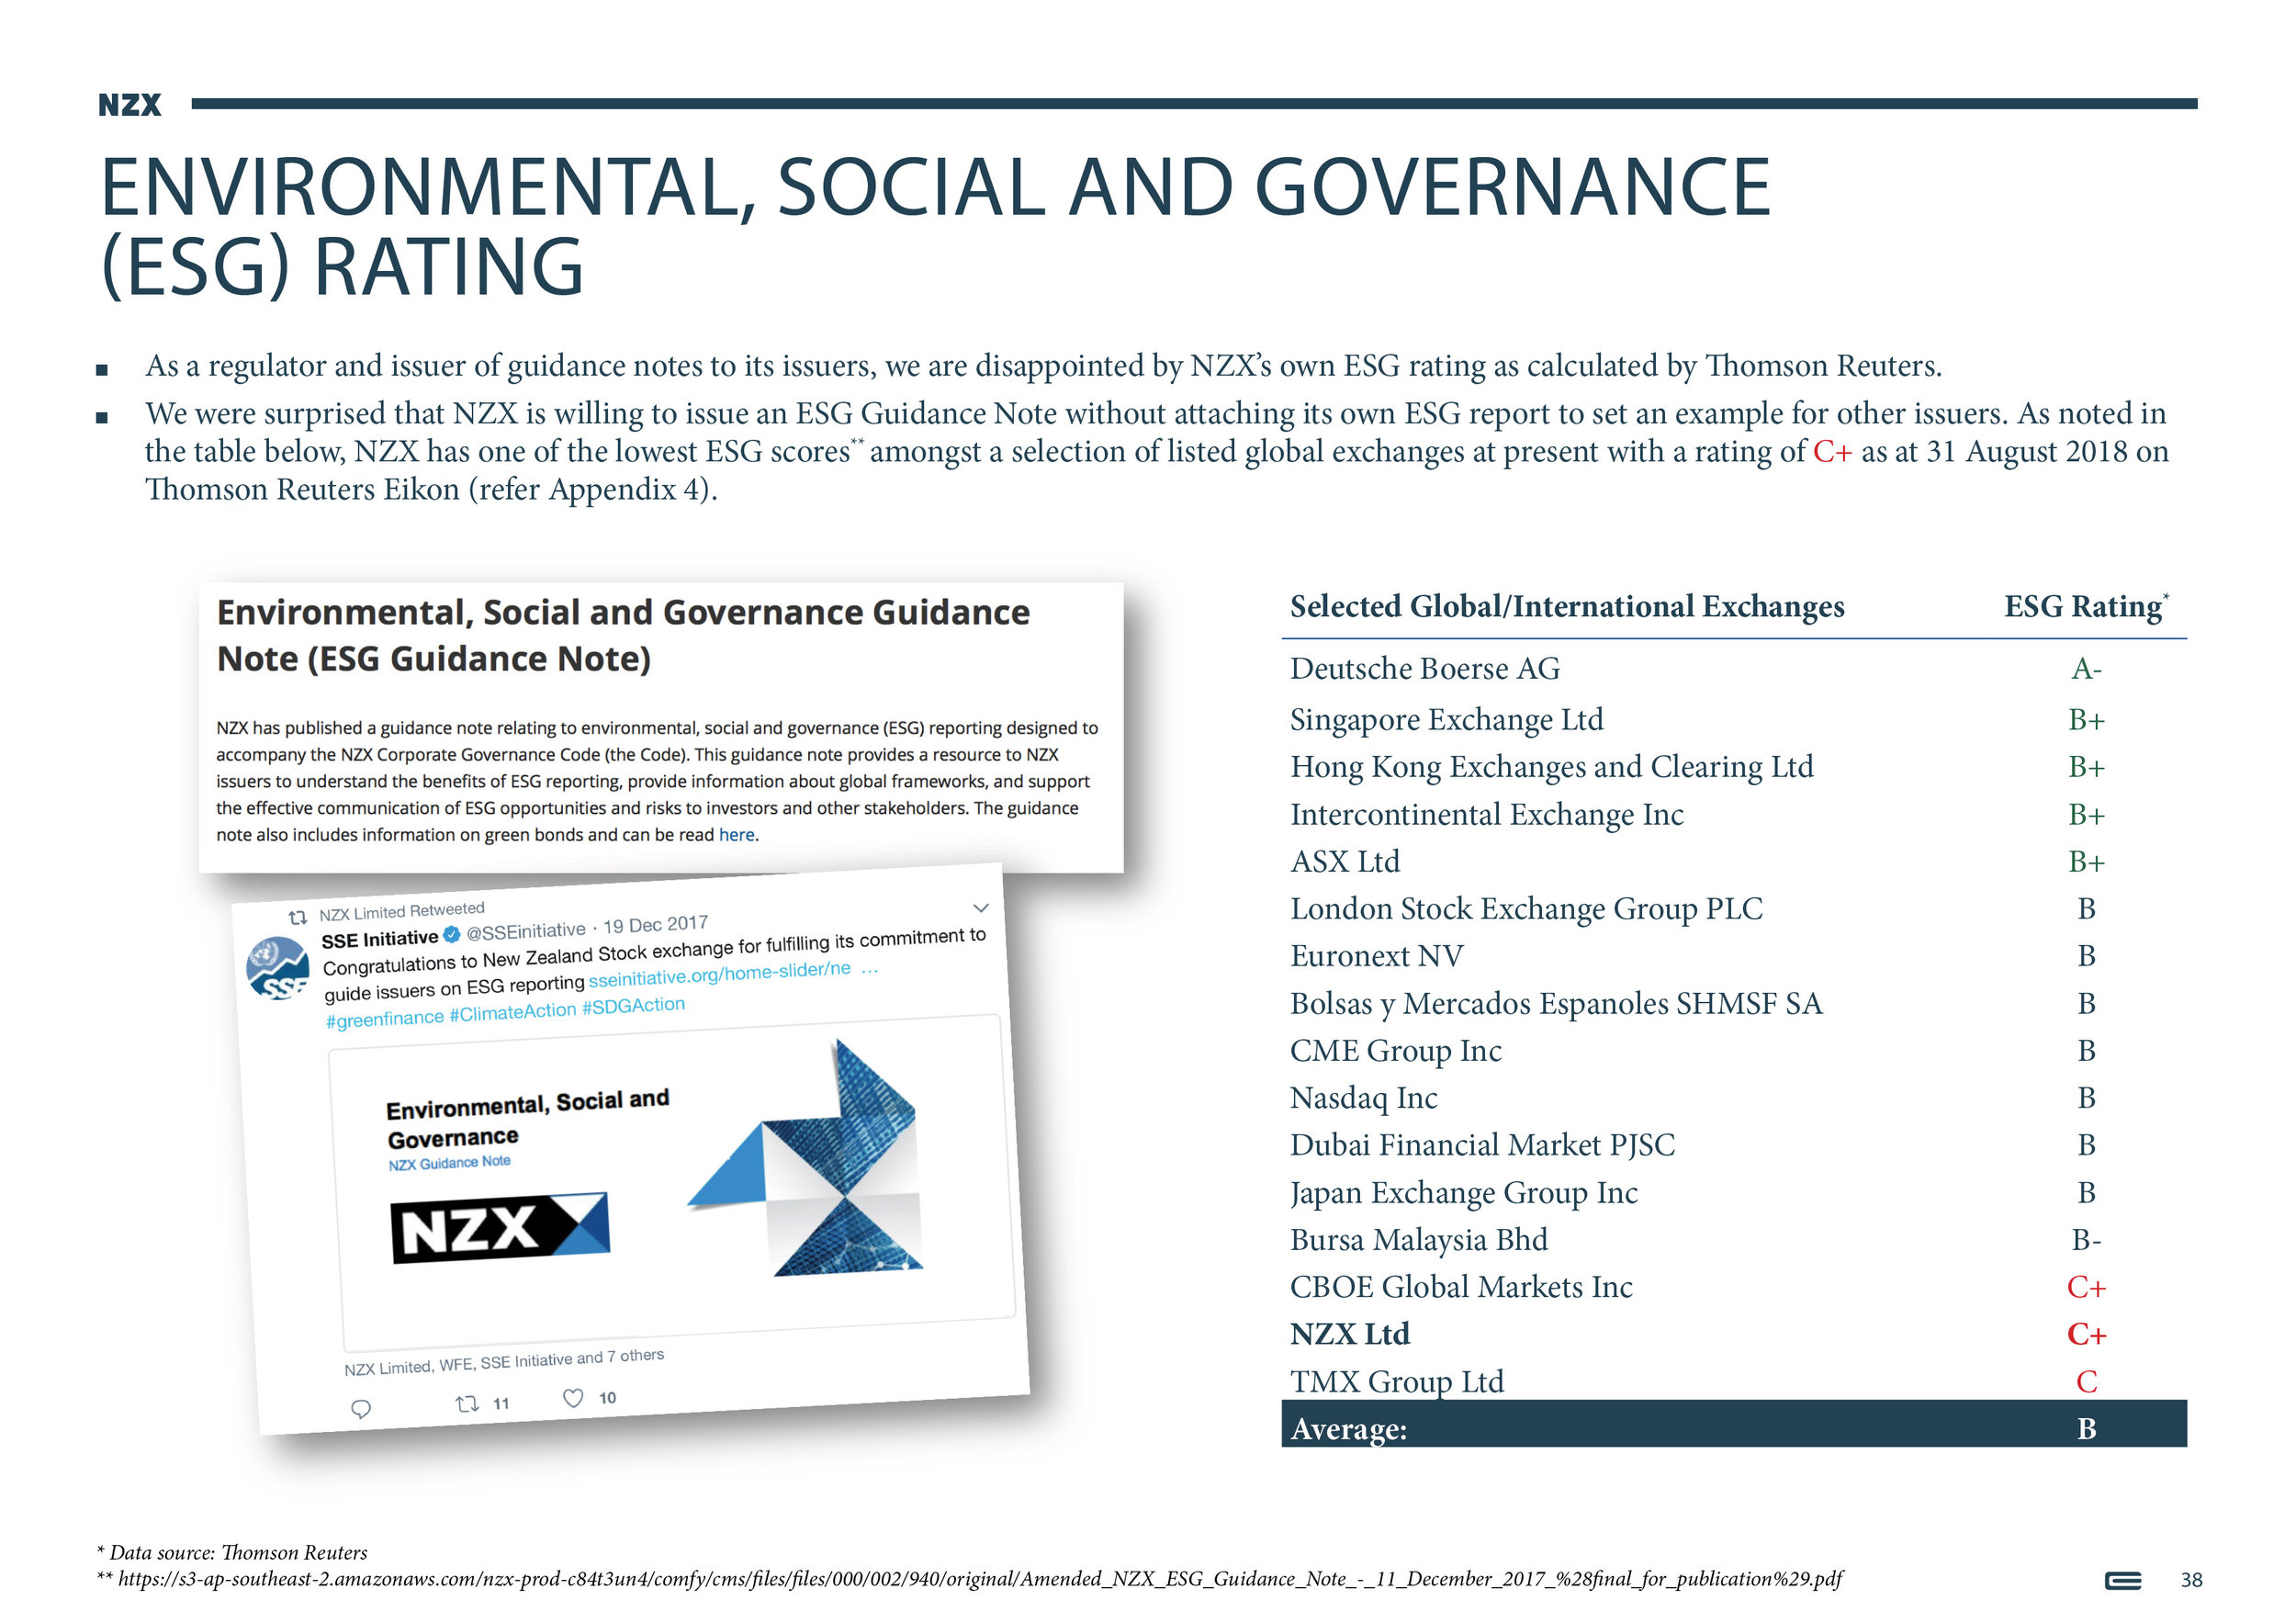 NZX Limited - Presentation - September 201838.jpg